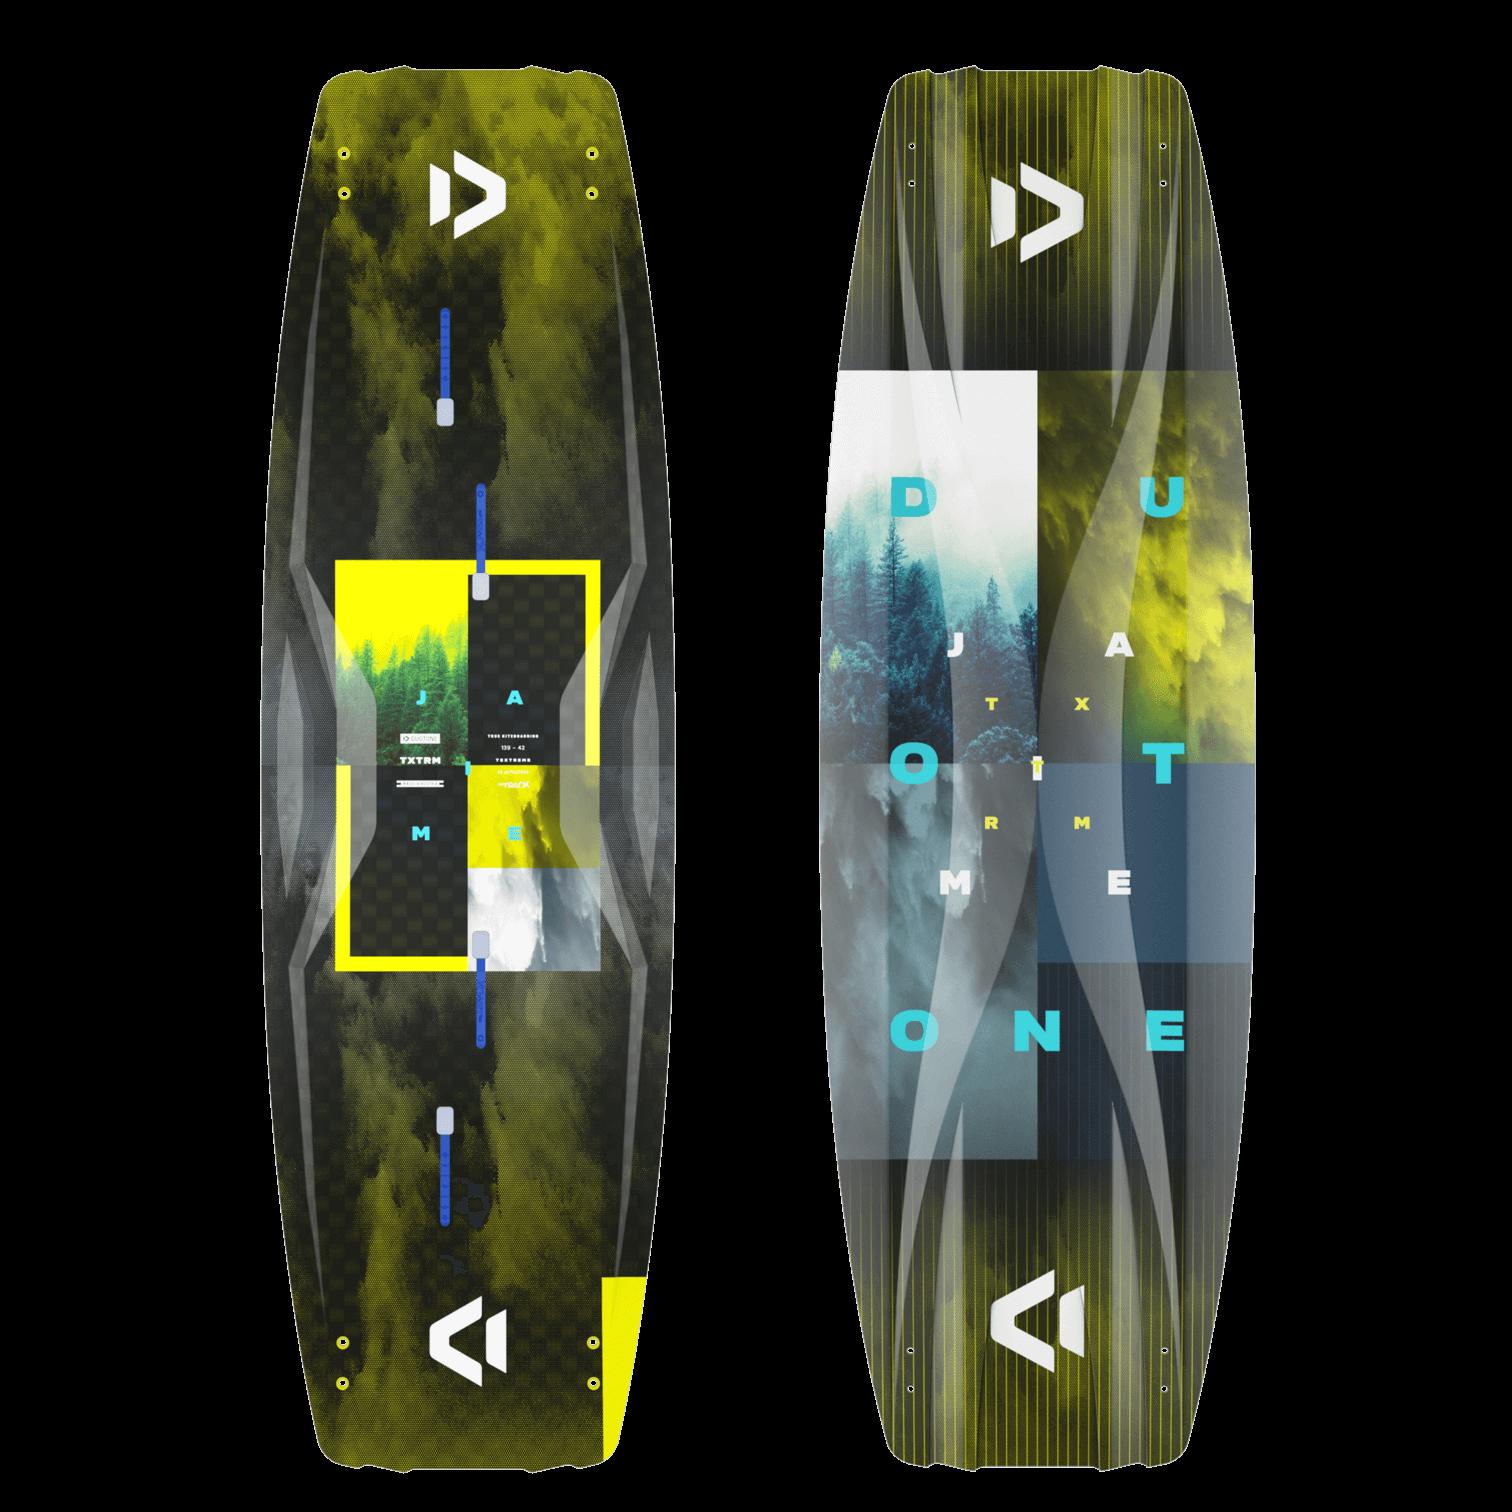 Duotone Jaime Textreme 2020 Twintip Carbon Kiteboard